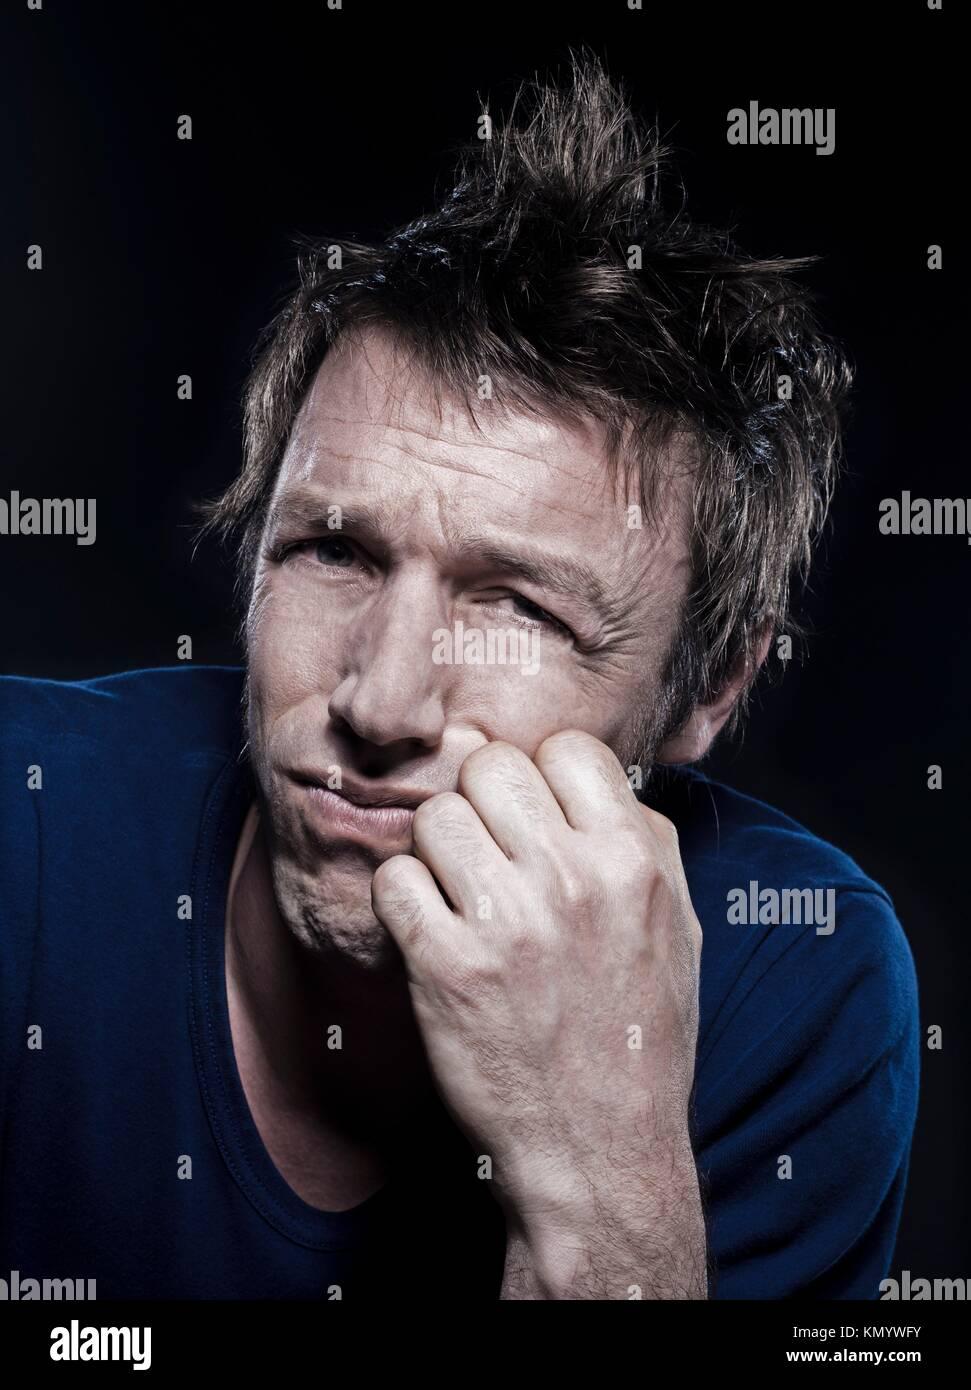 studio portrait on black background of a funny expressive caucasian man puckering sad sullen - Stock Image